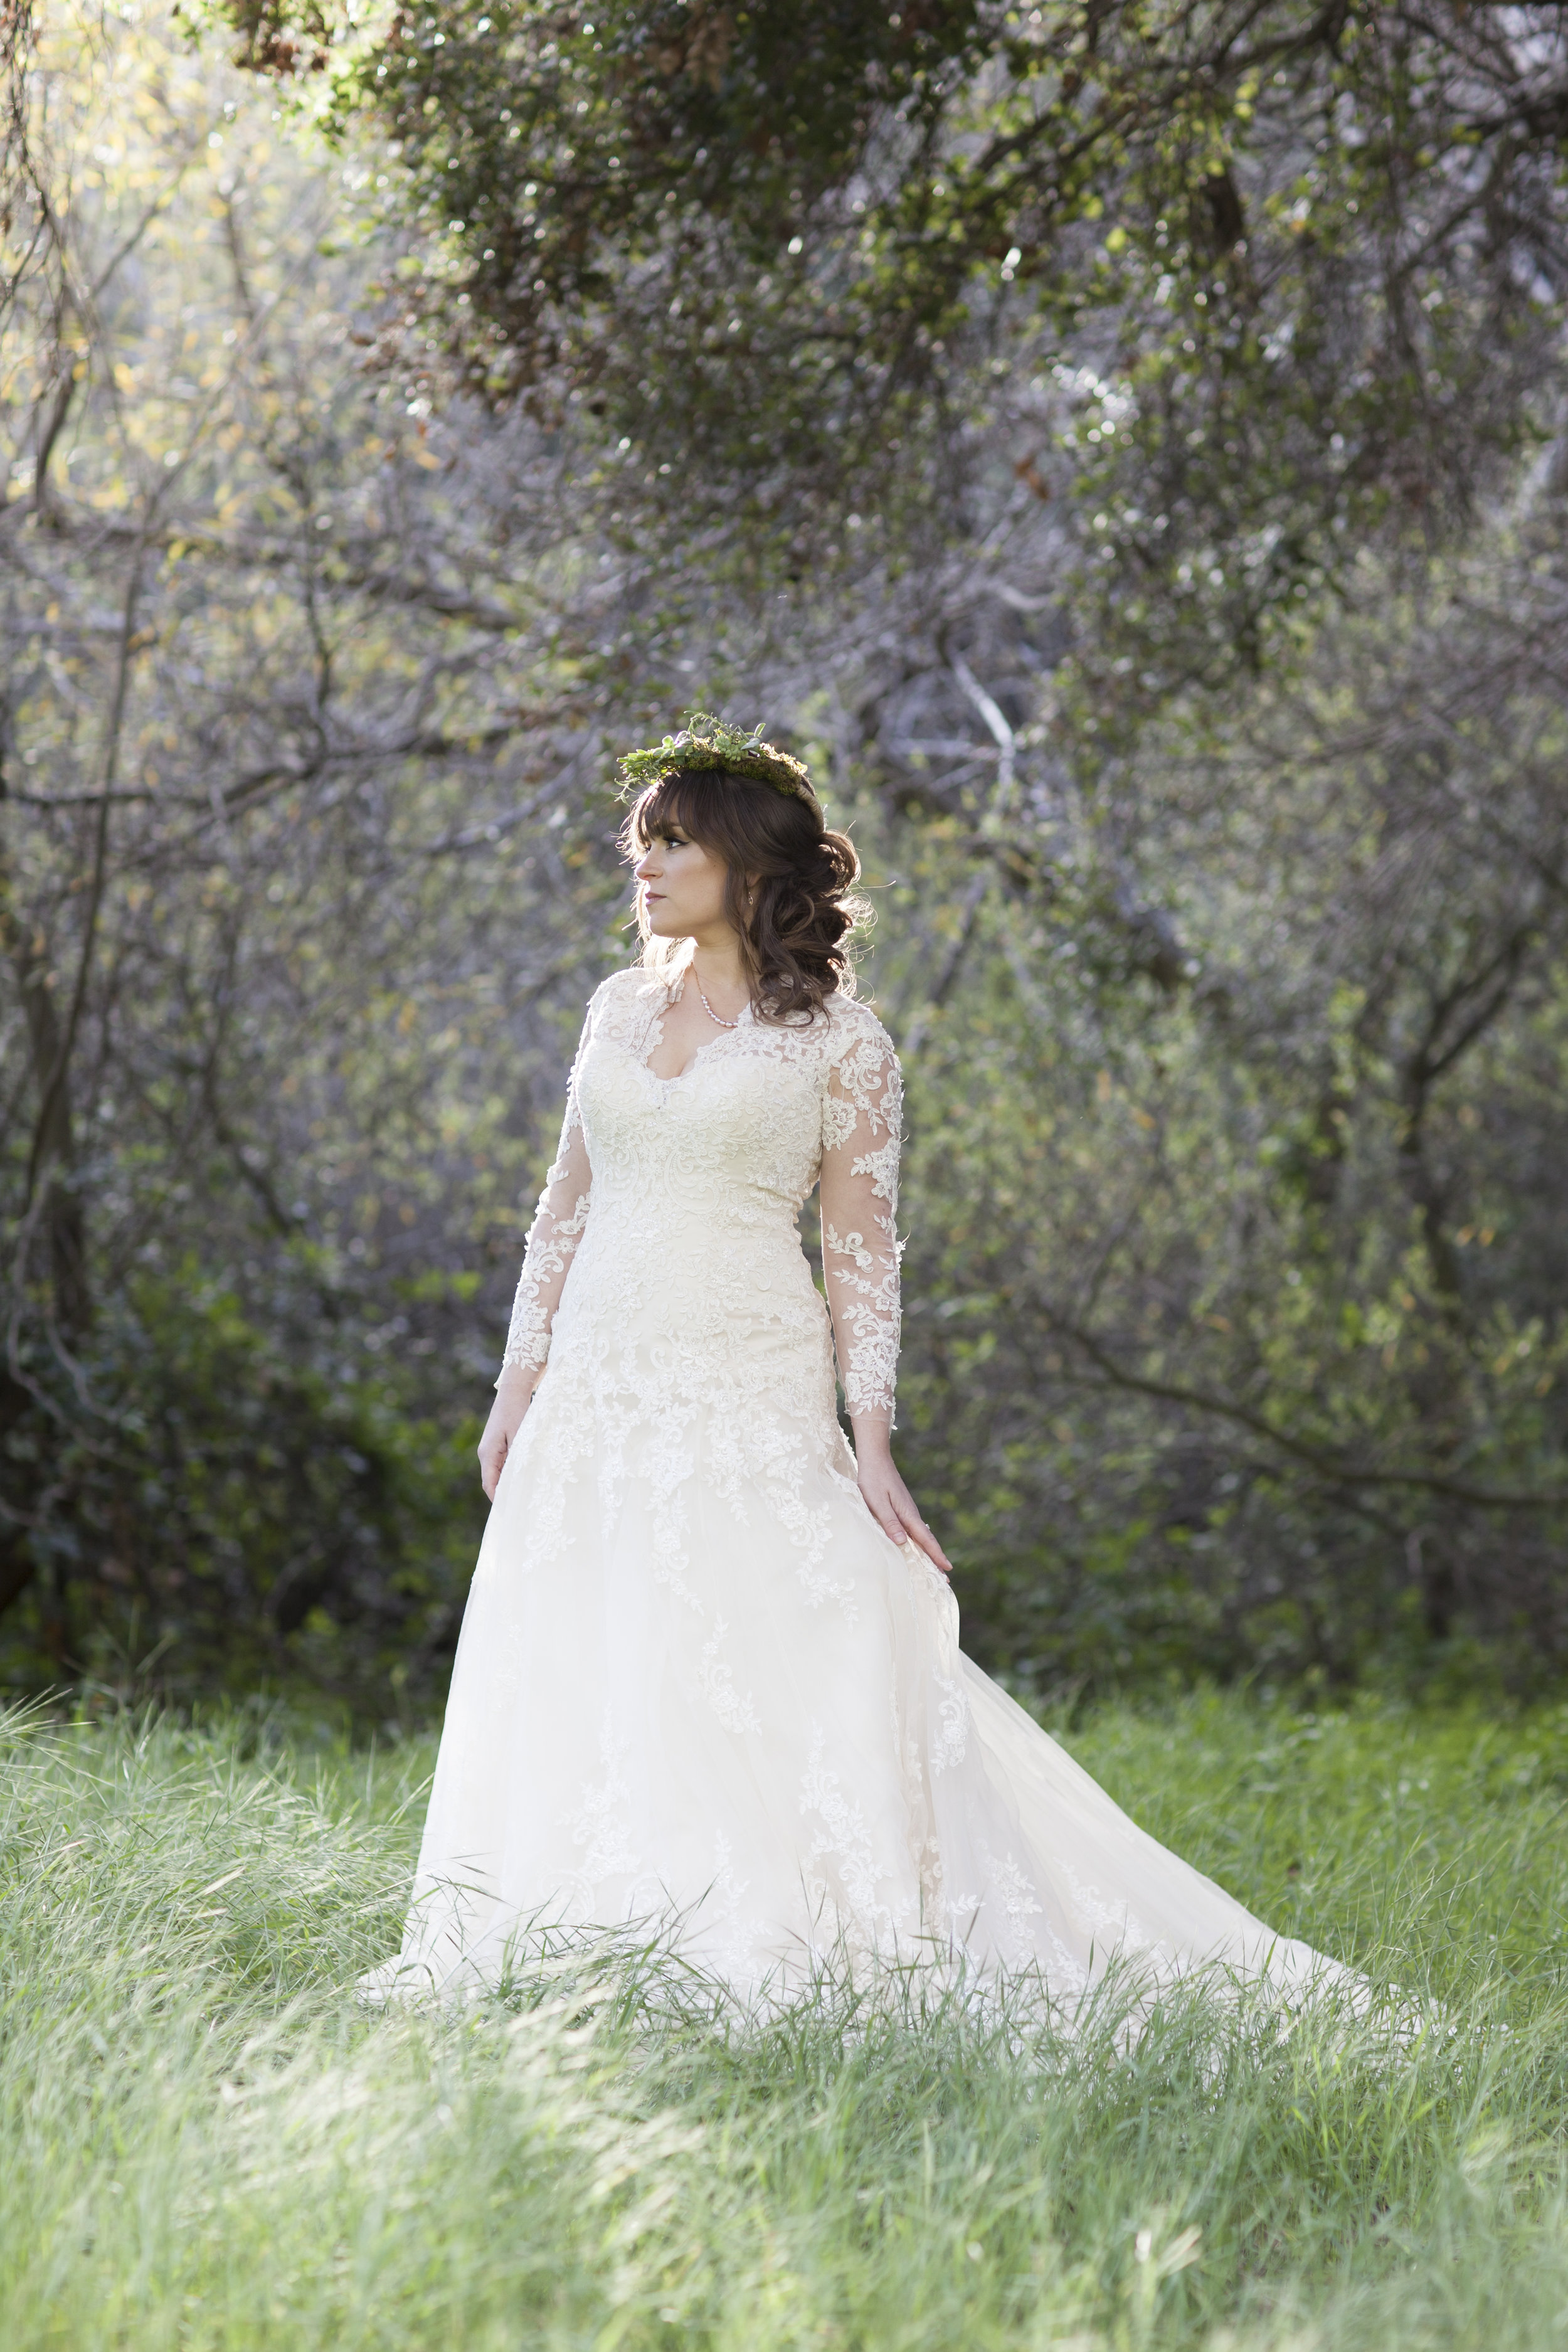 Sierra_bridalstyle-29.jpg